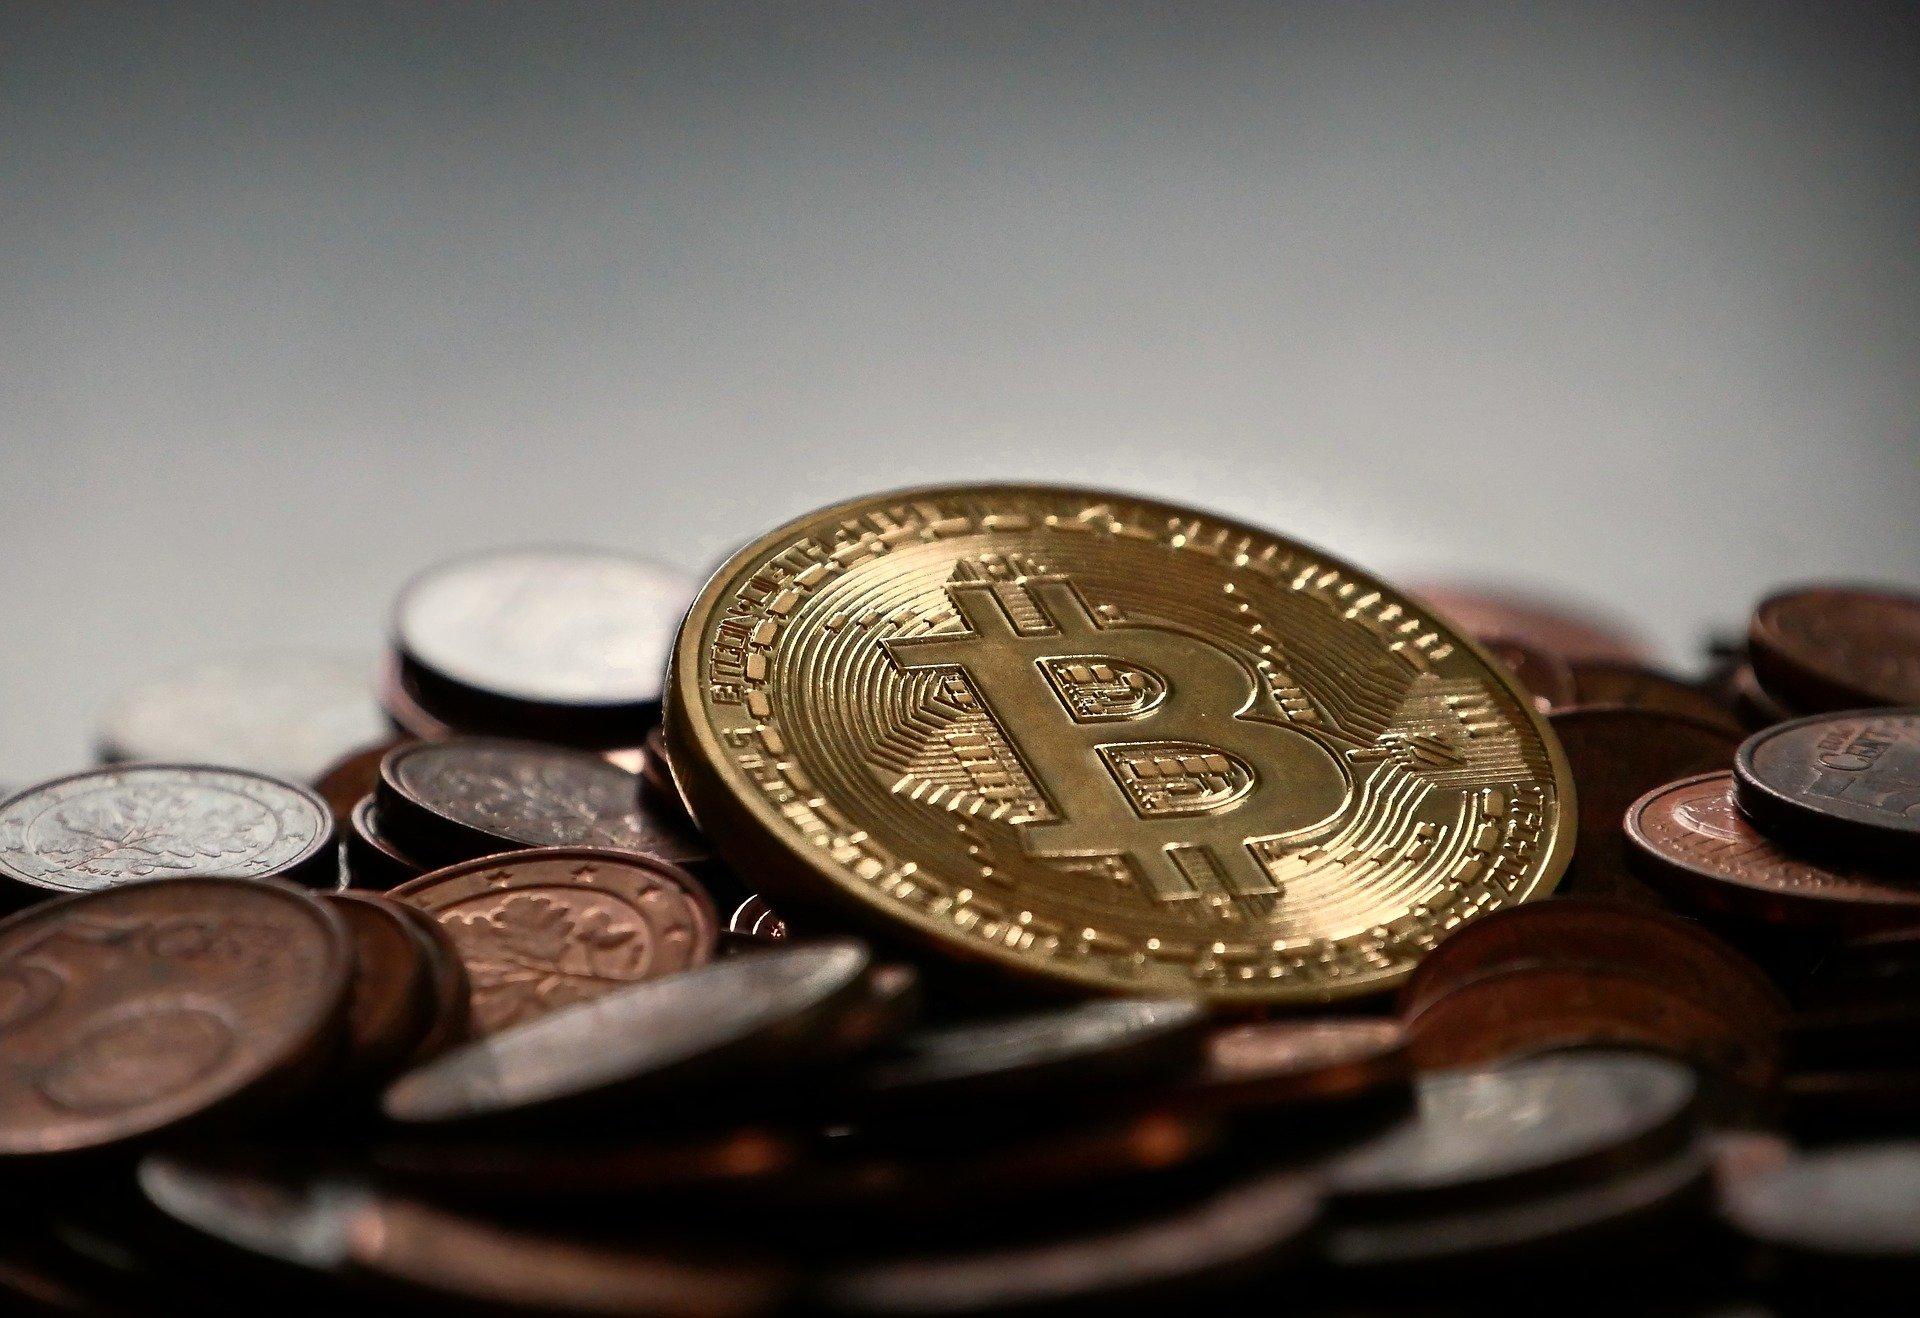 bitcoin 2007912 1920.jpg?resize=412,232 - 誰でも分かる仮想通貨の仕組み Part1